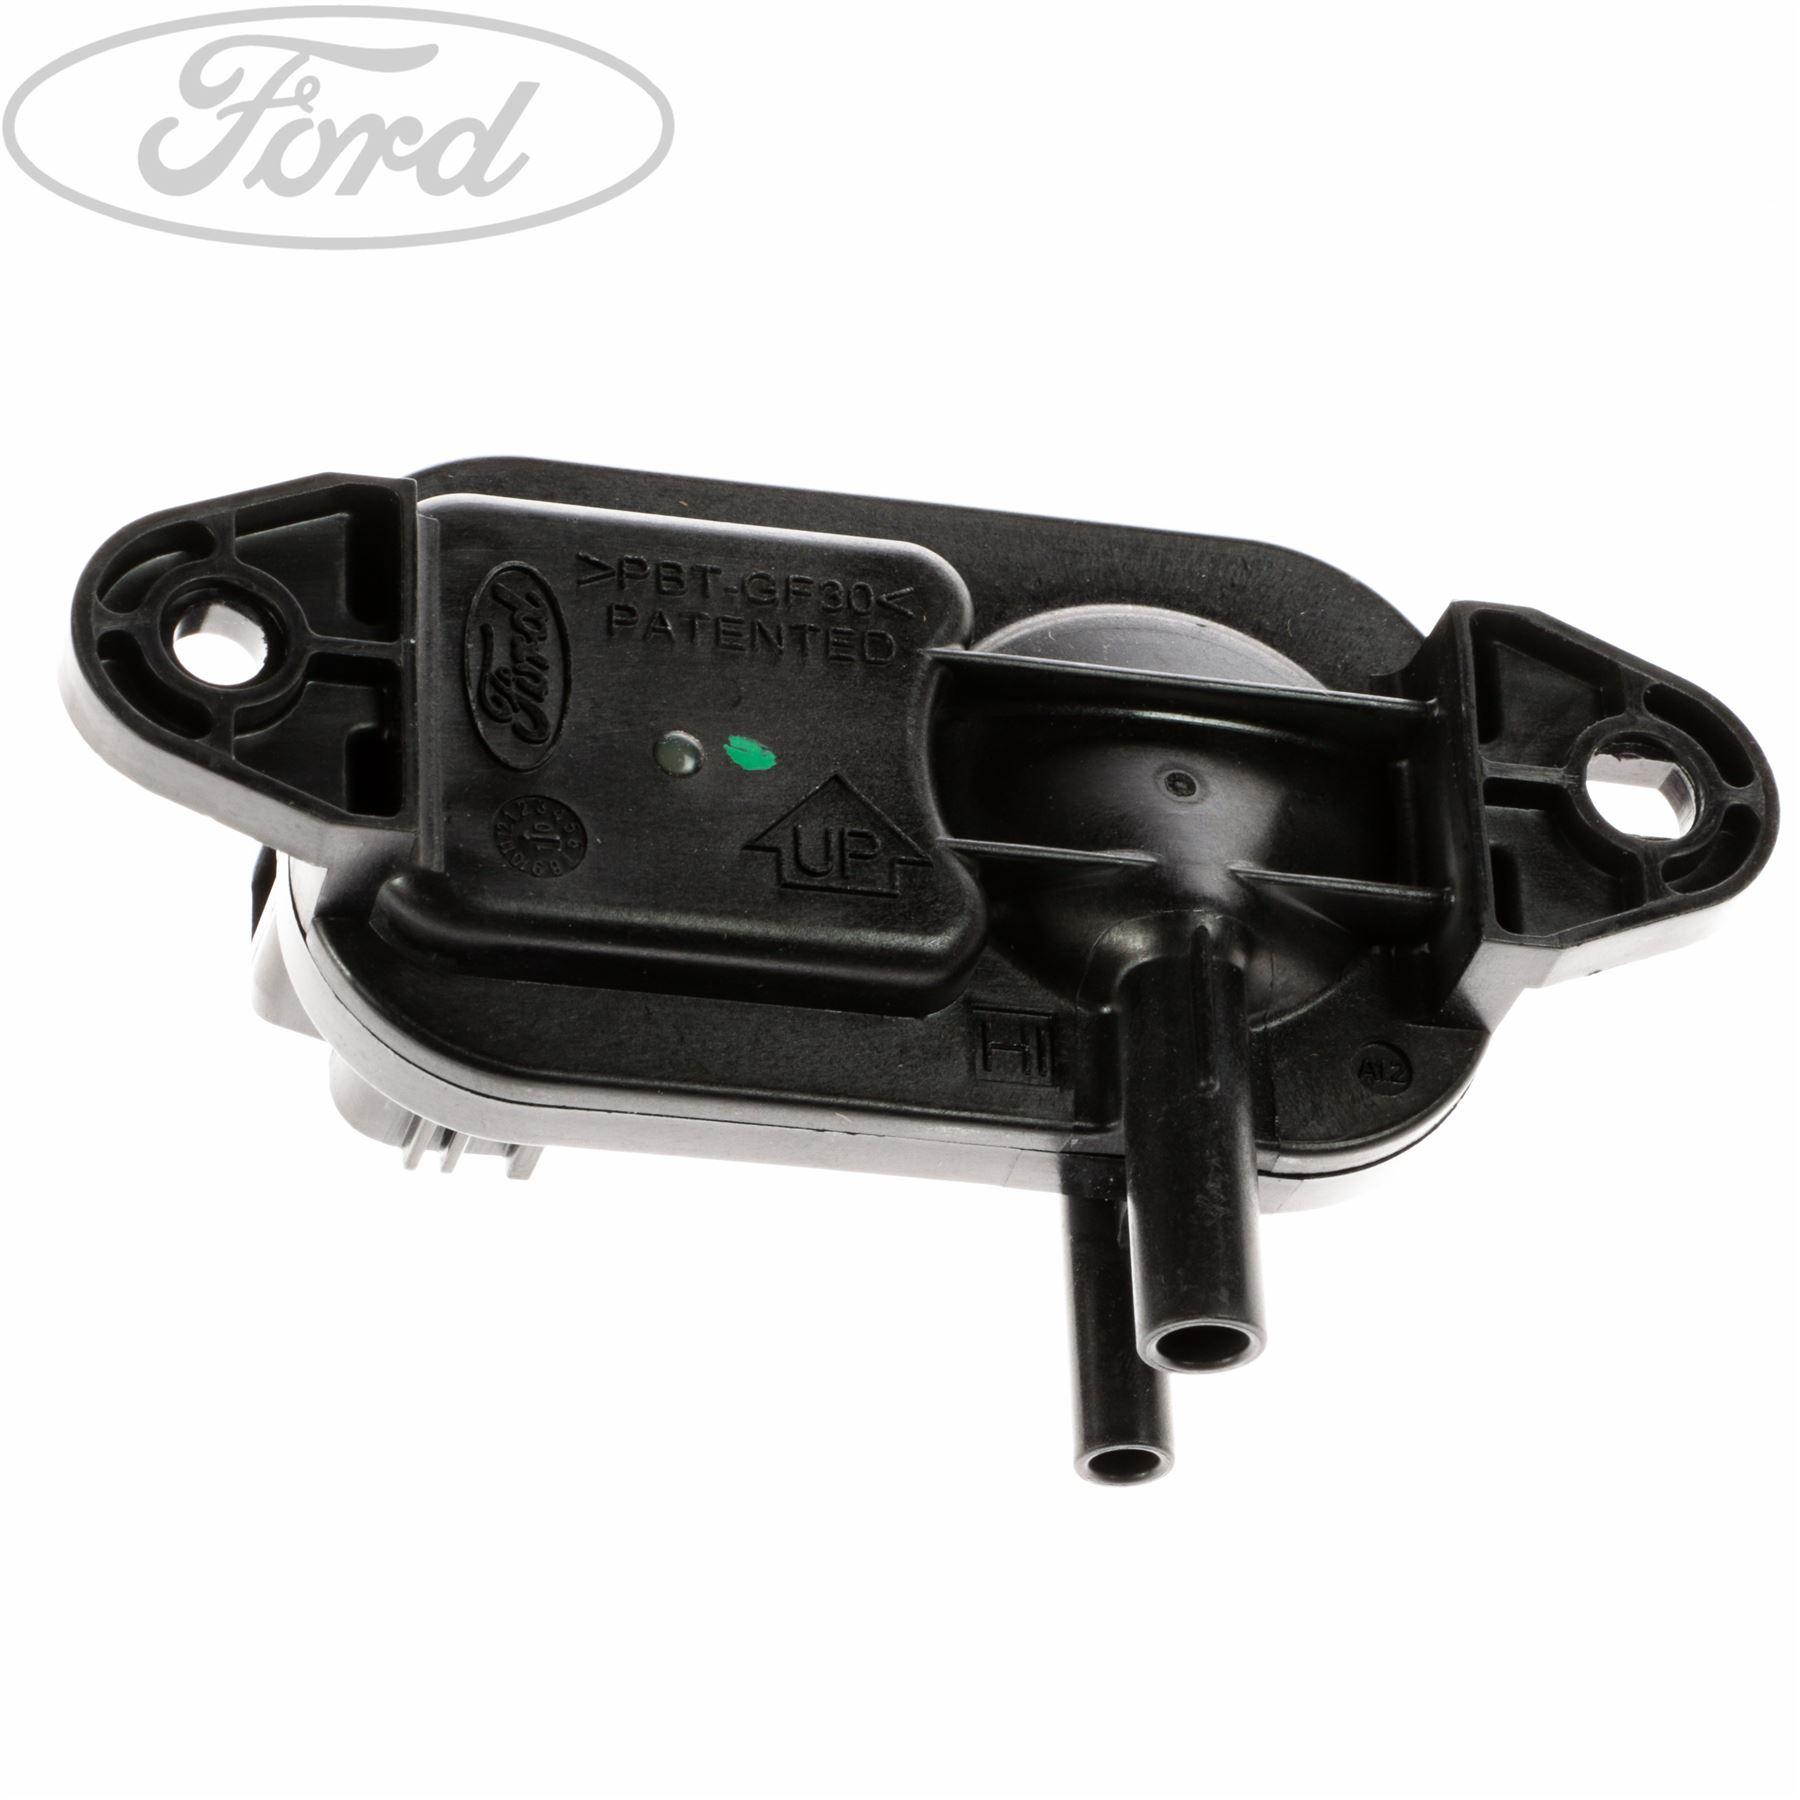 DPF Sensor for Ford Mondeo MK4 S-Max WA6 2.0 2.2 TDCi Kuga MK1 2.0 TDCi 1415606